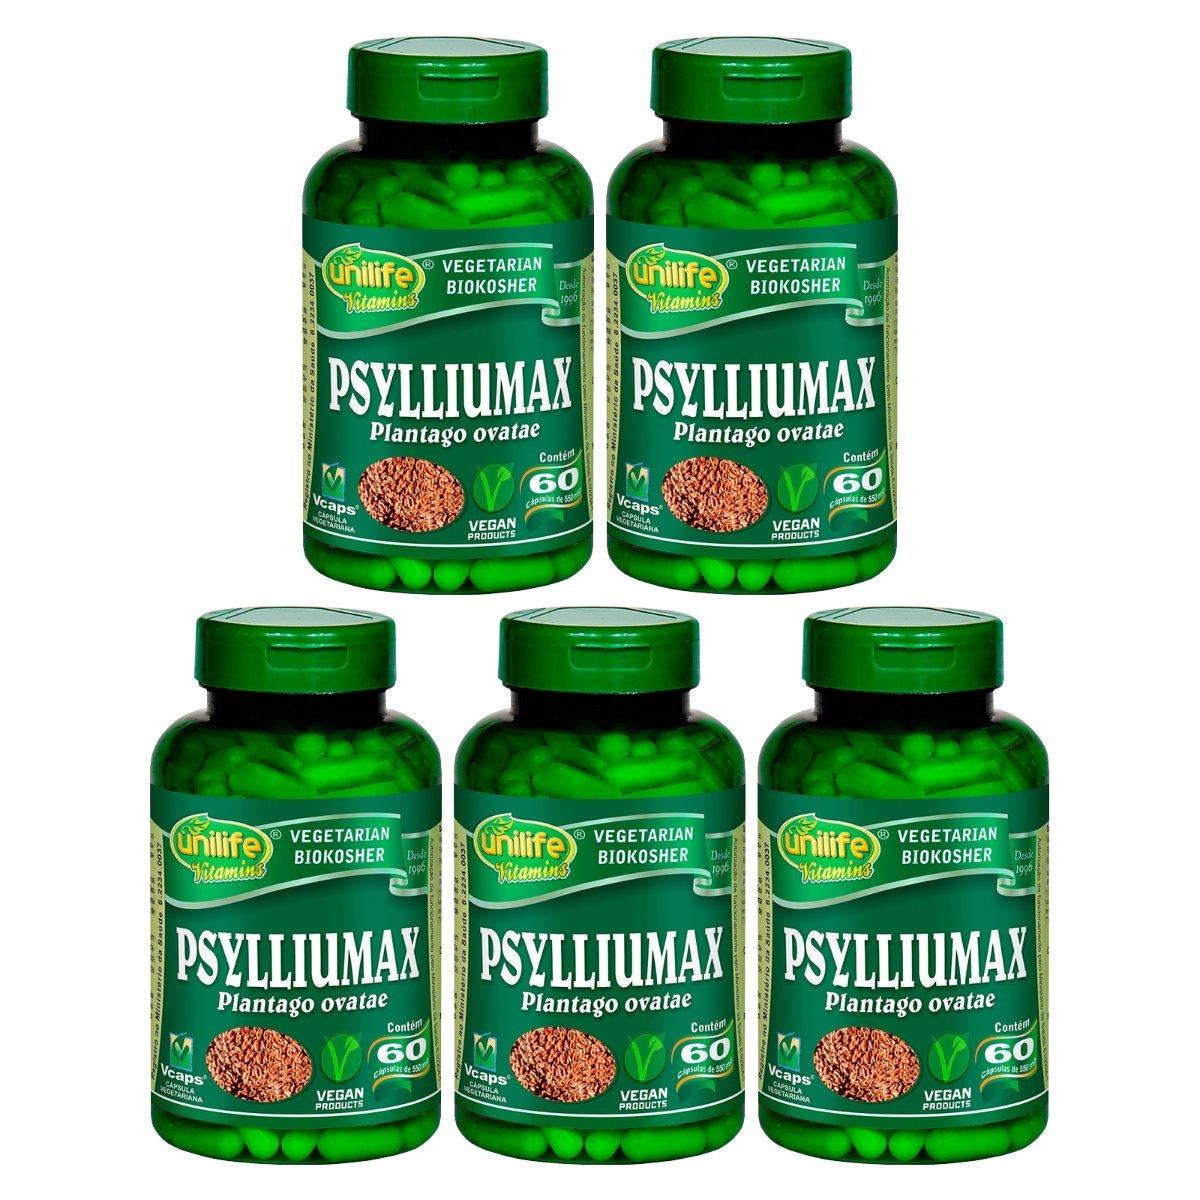 Psylliumax Psyllium 60 Cápsulas 550mg Unilife Kit 5 Unidades